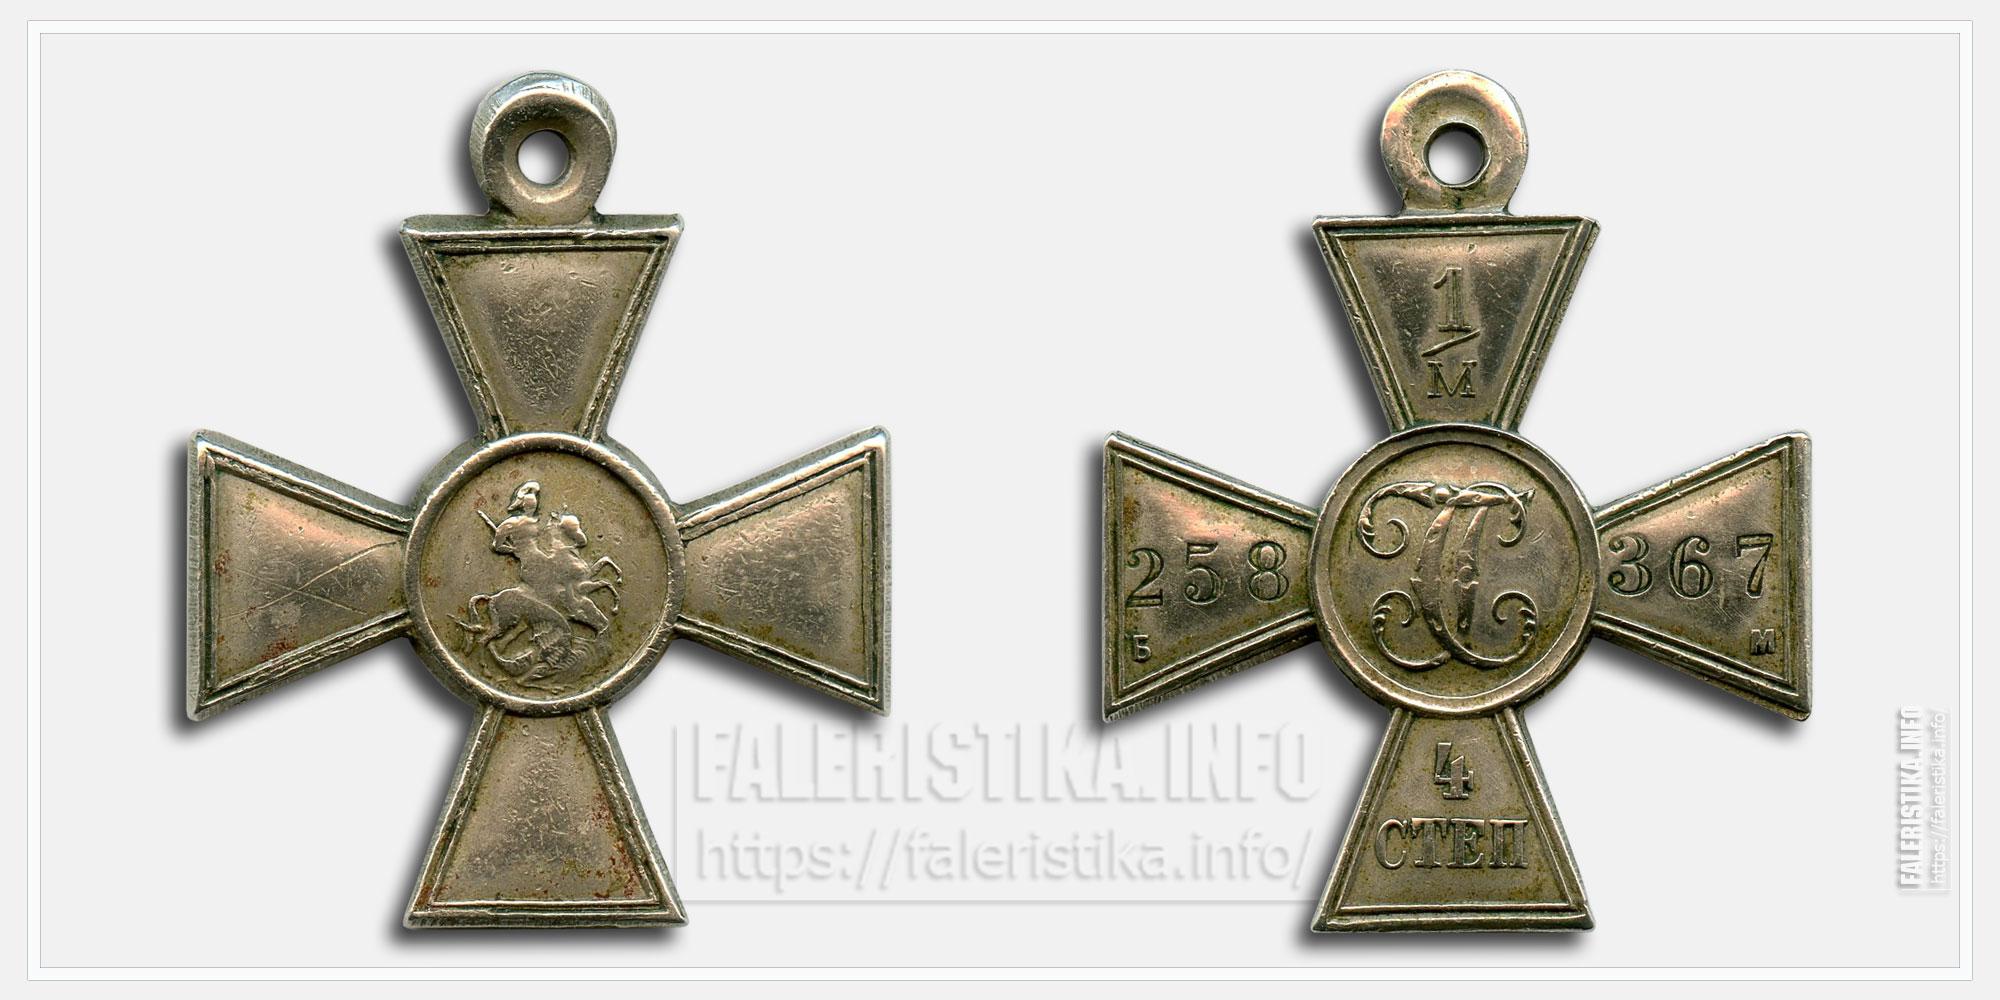 Георгиевский крест 4 ст. Белый металл